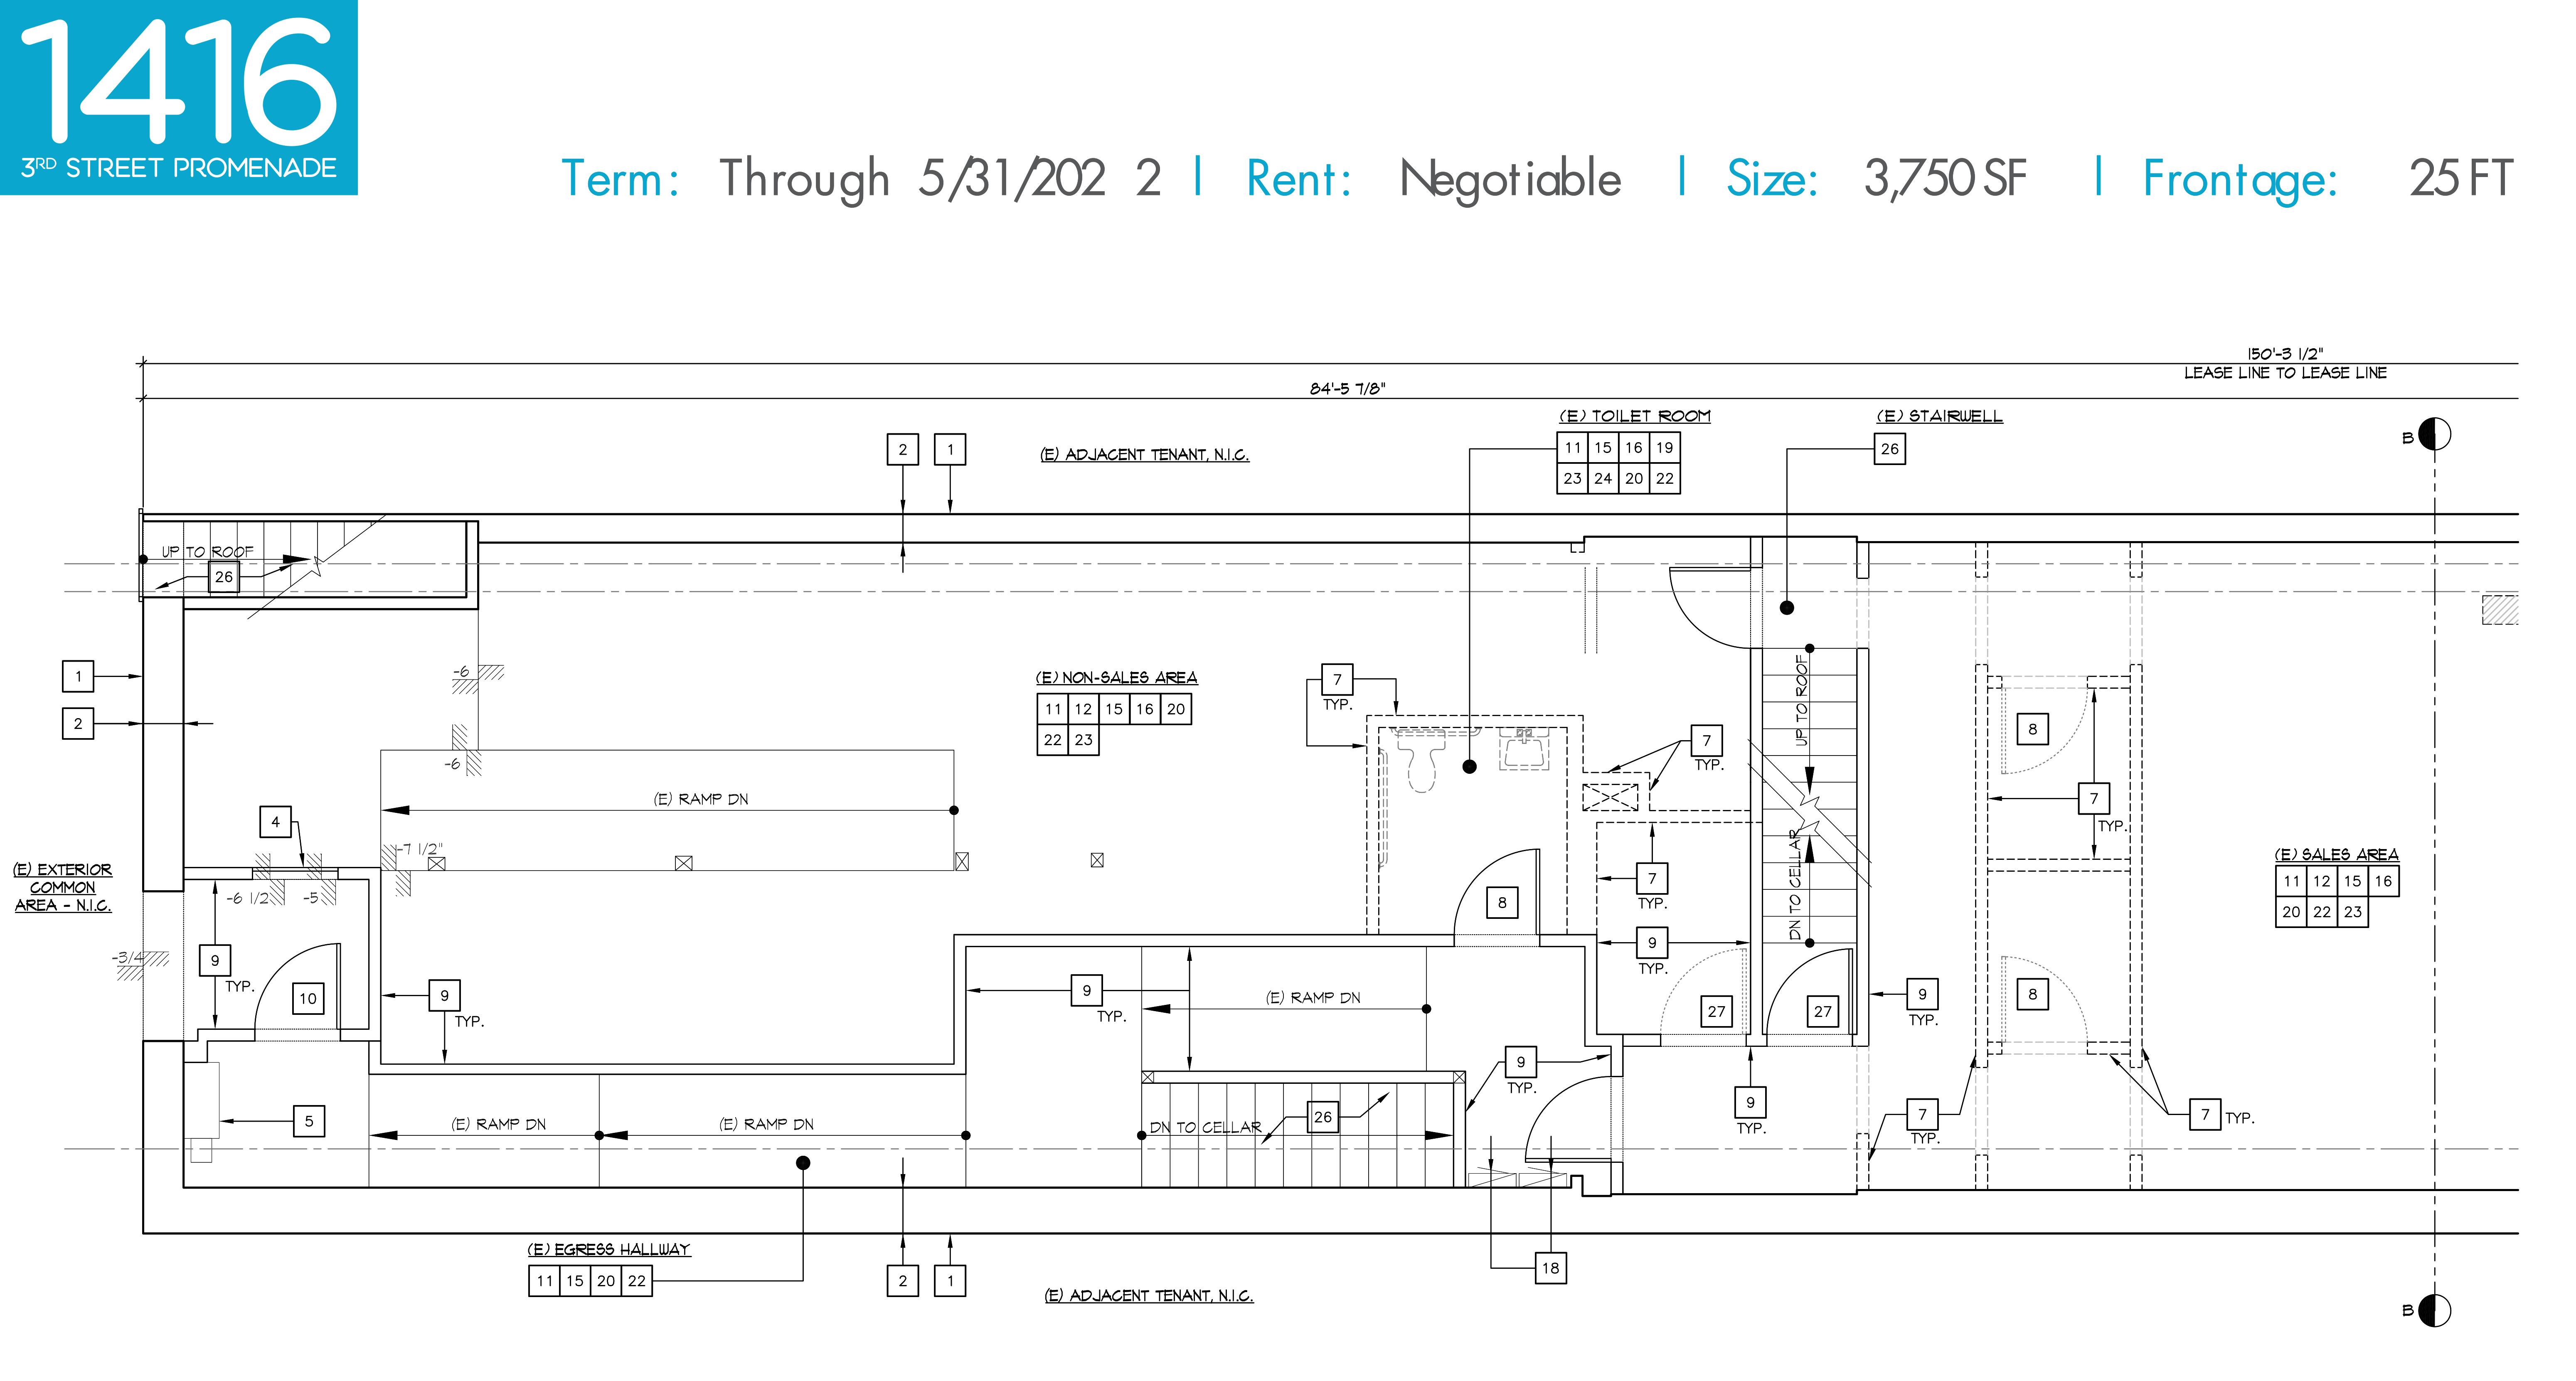 1416 3rd Street Promenade: site plan